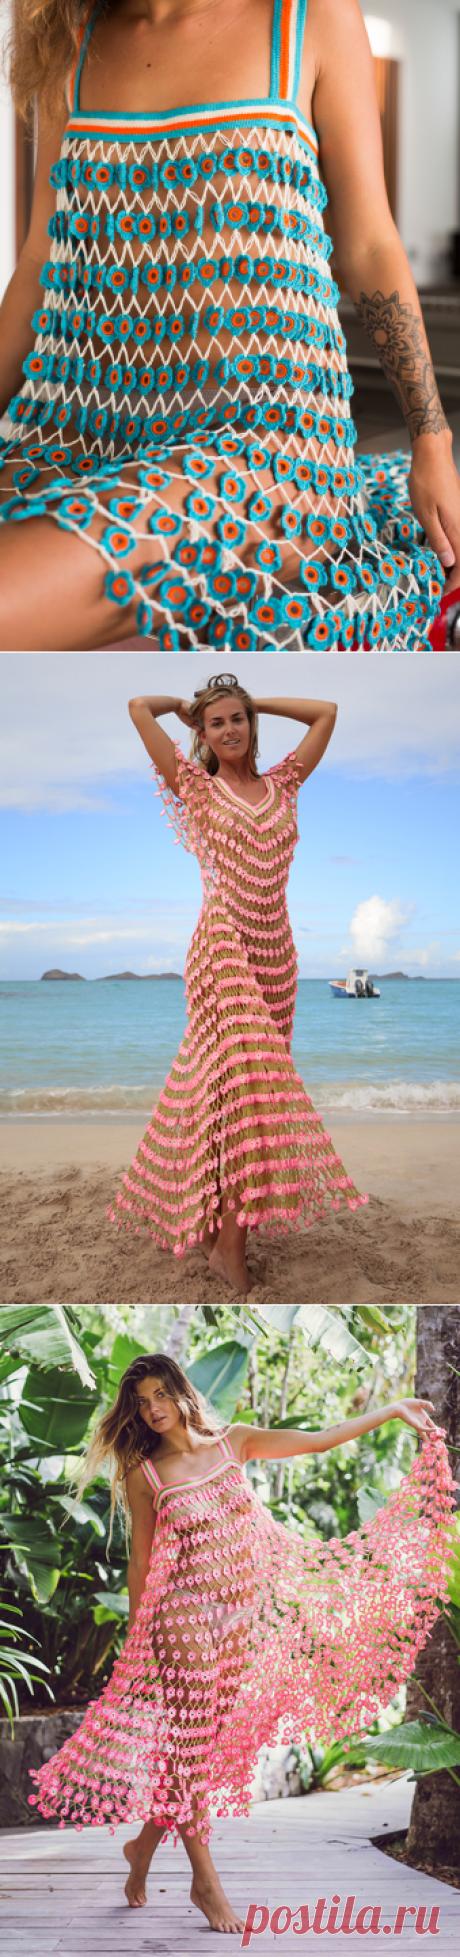 Flower Power Crochet Blue Mini Dress-My Beachy SideИдеи.